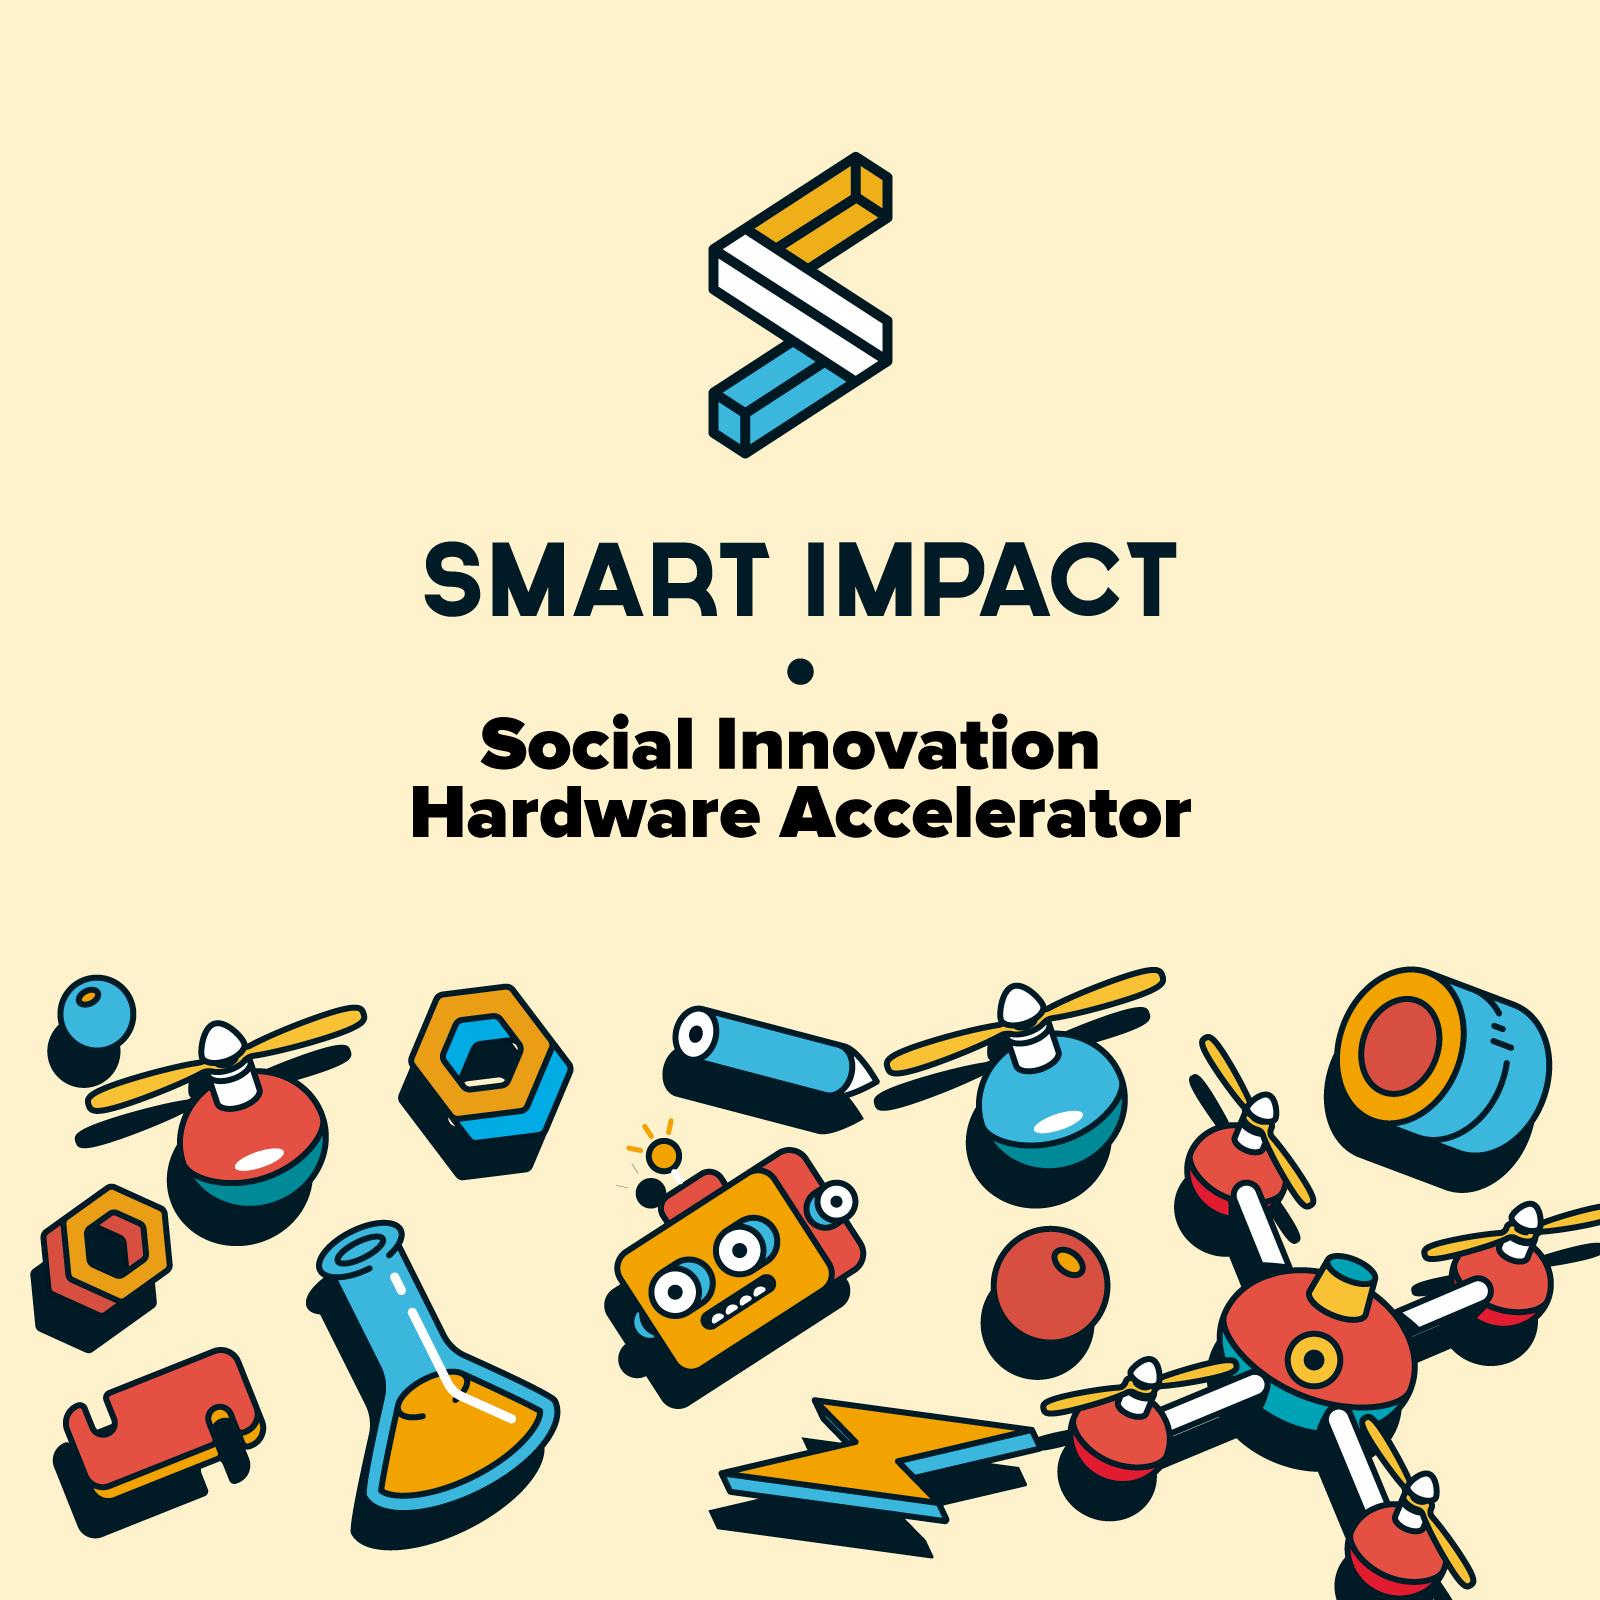 SMART IMPACT 2